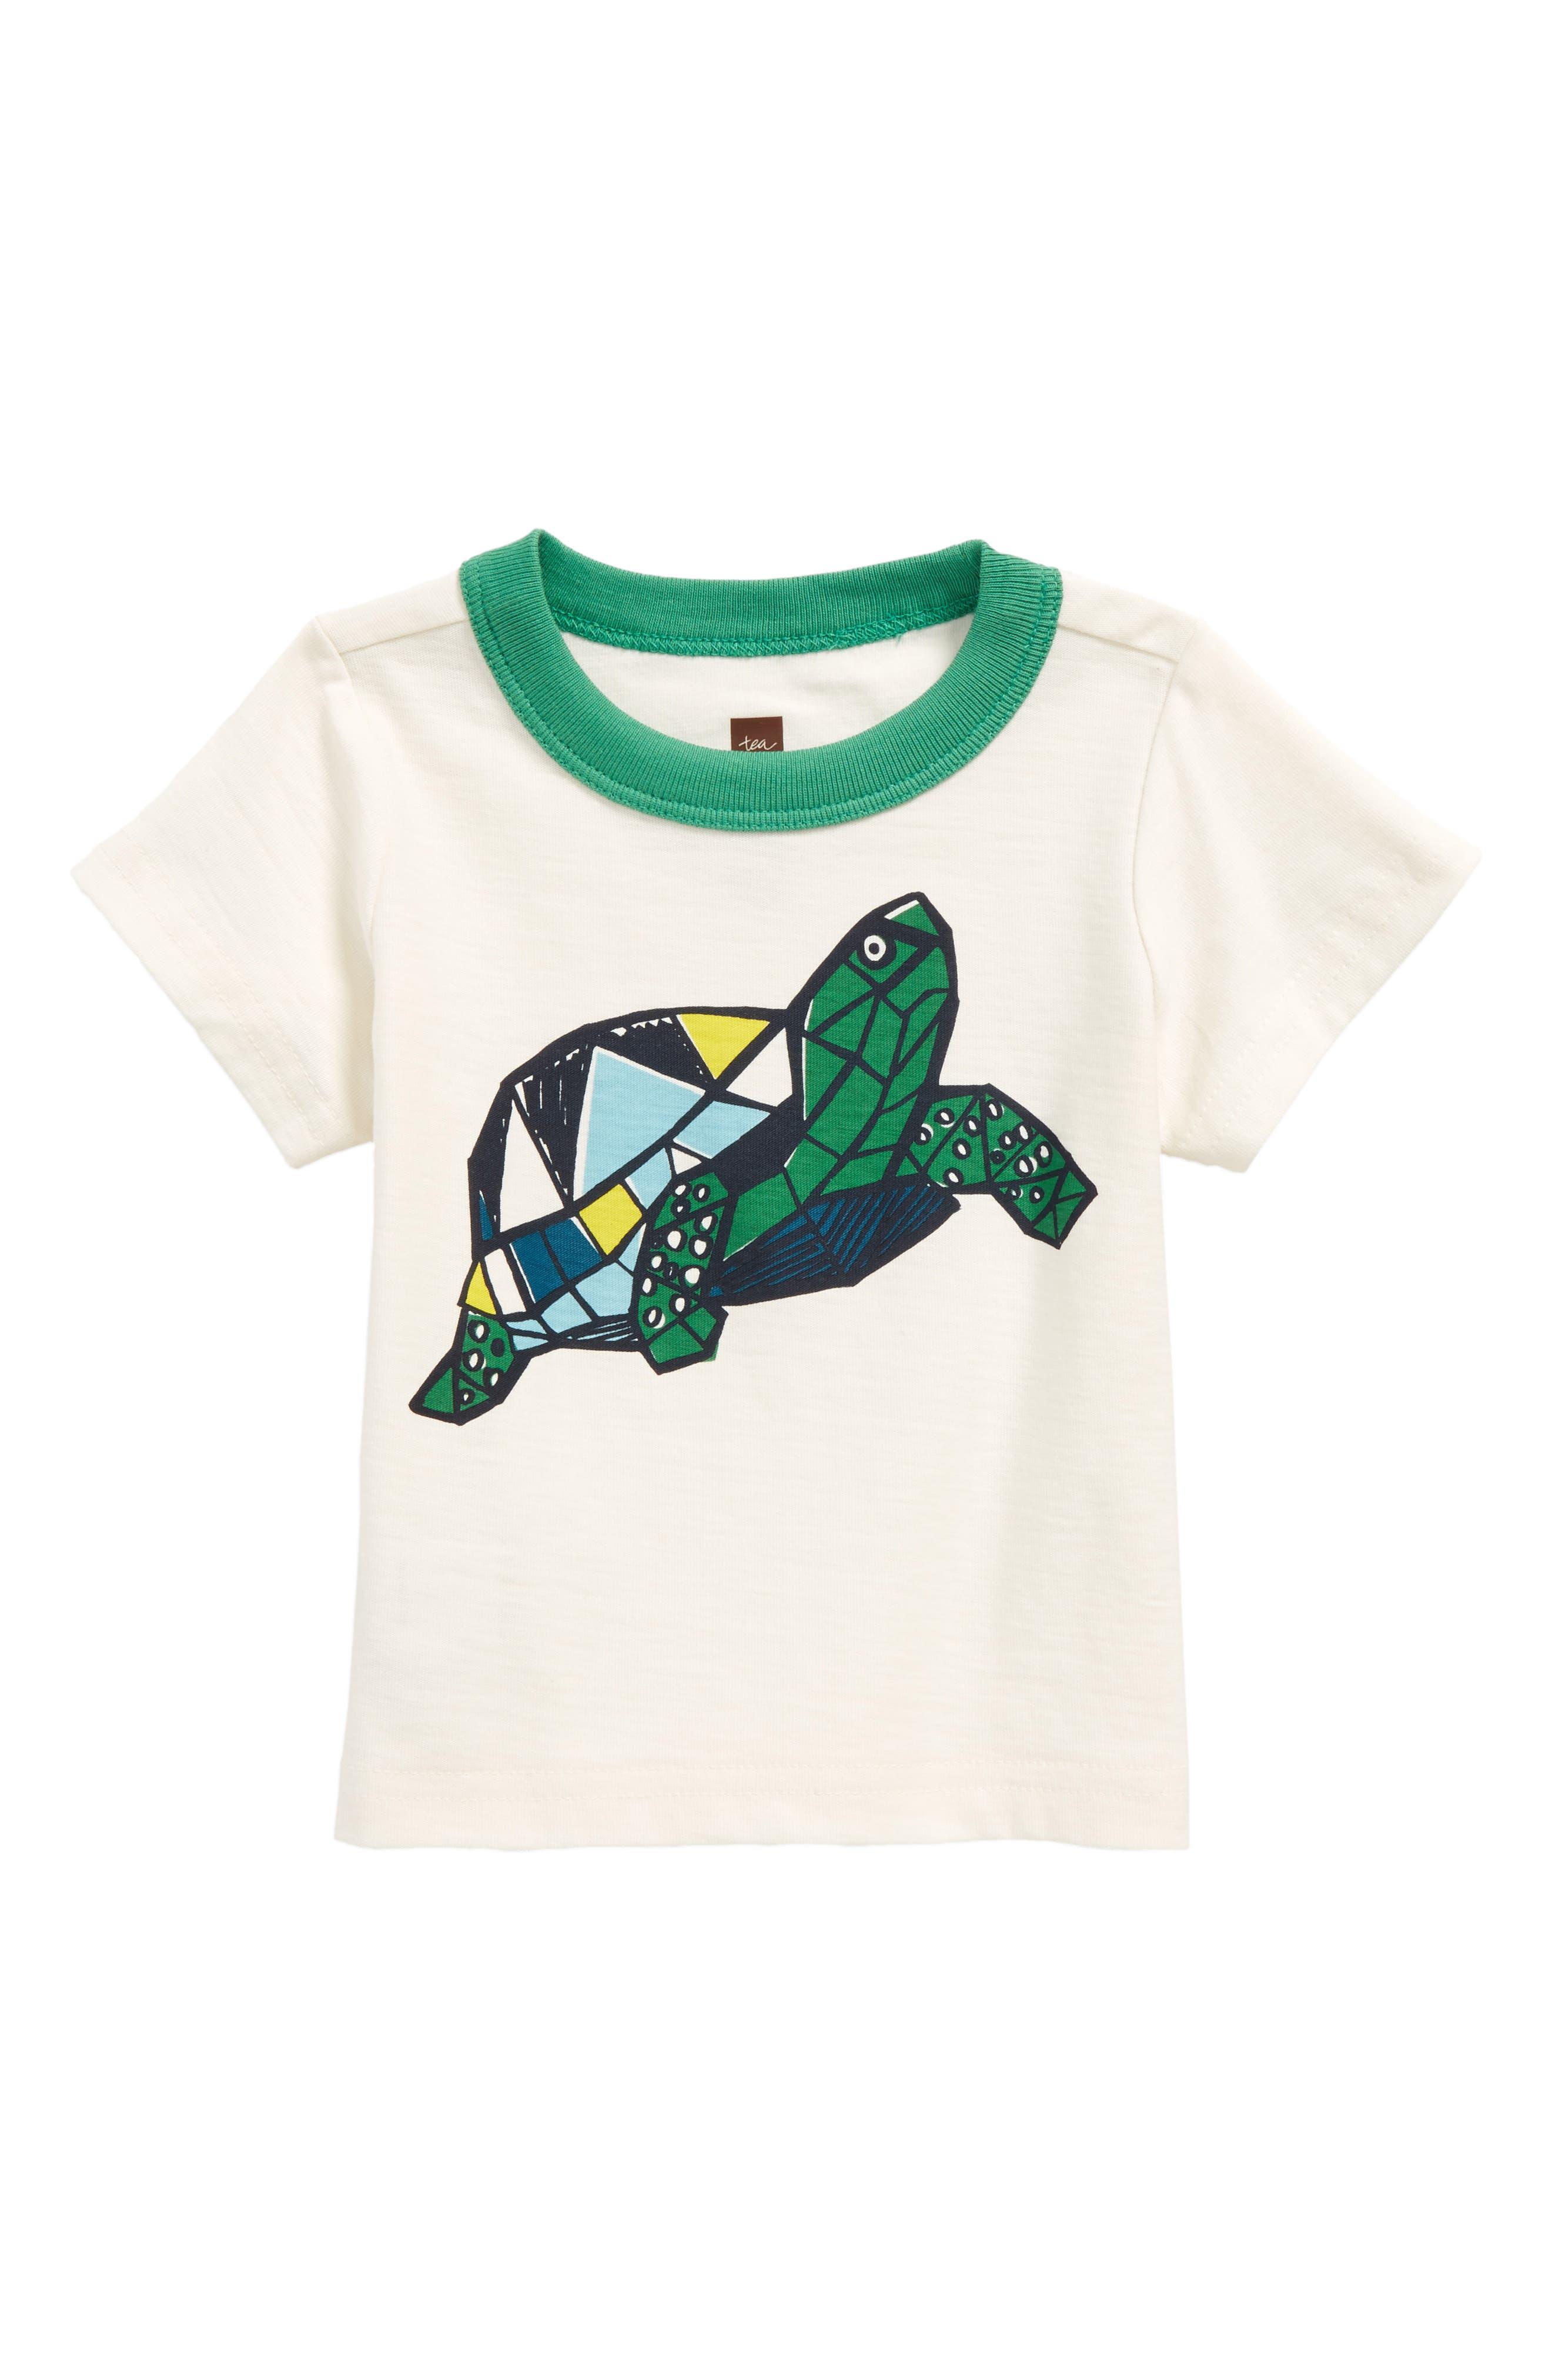 Turtle Power T-Shirt,                             Main thumbnail 1, color,                             900